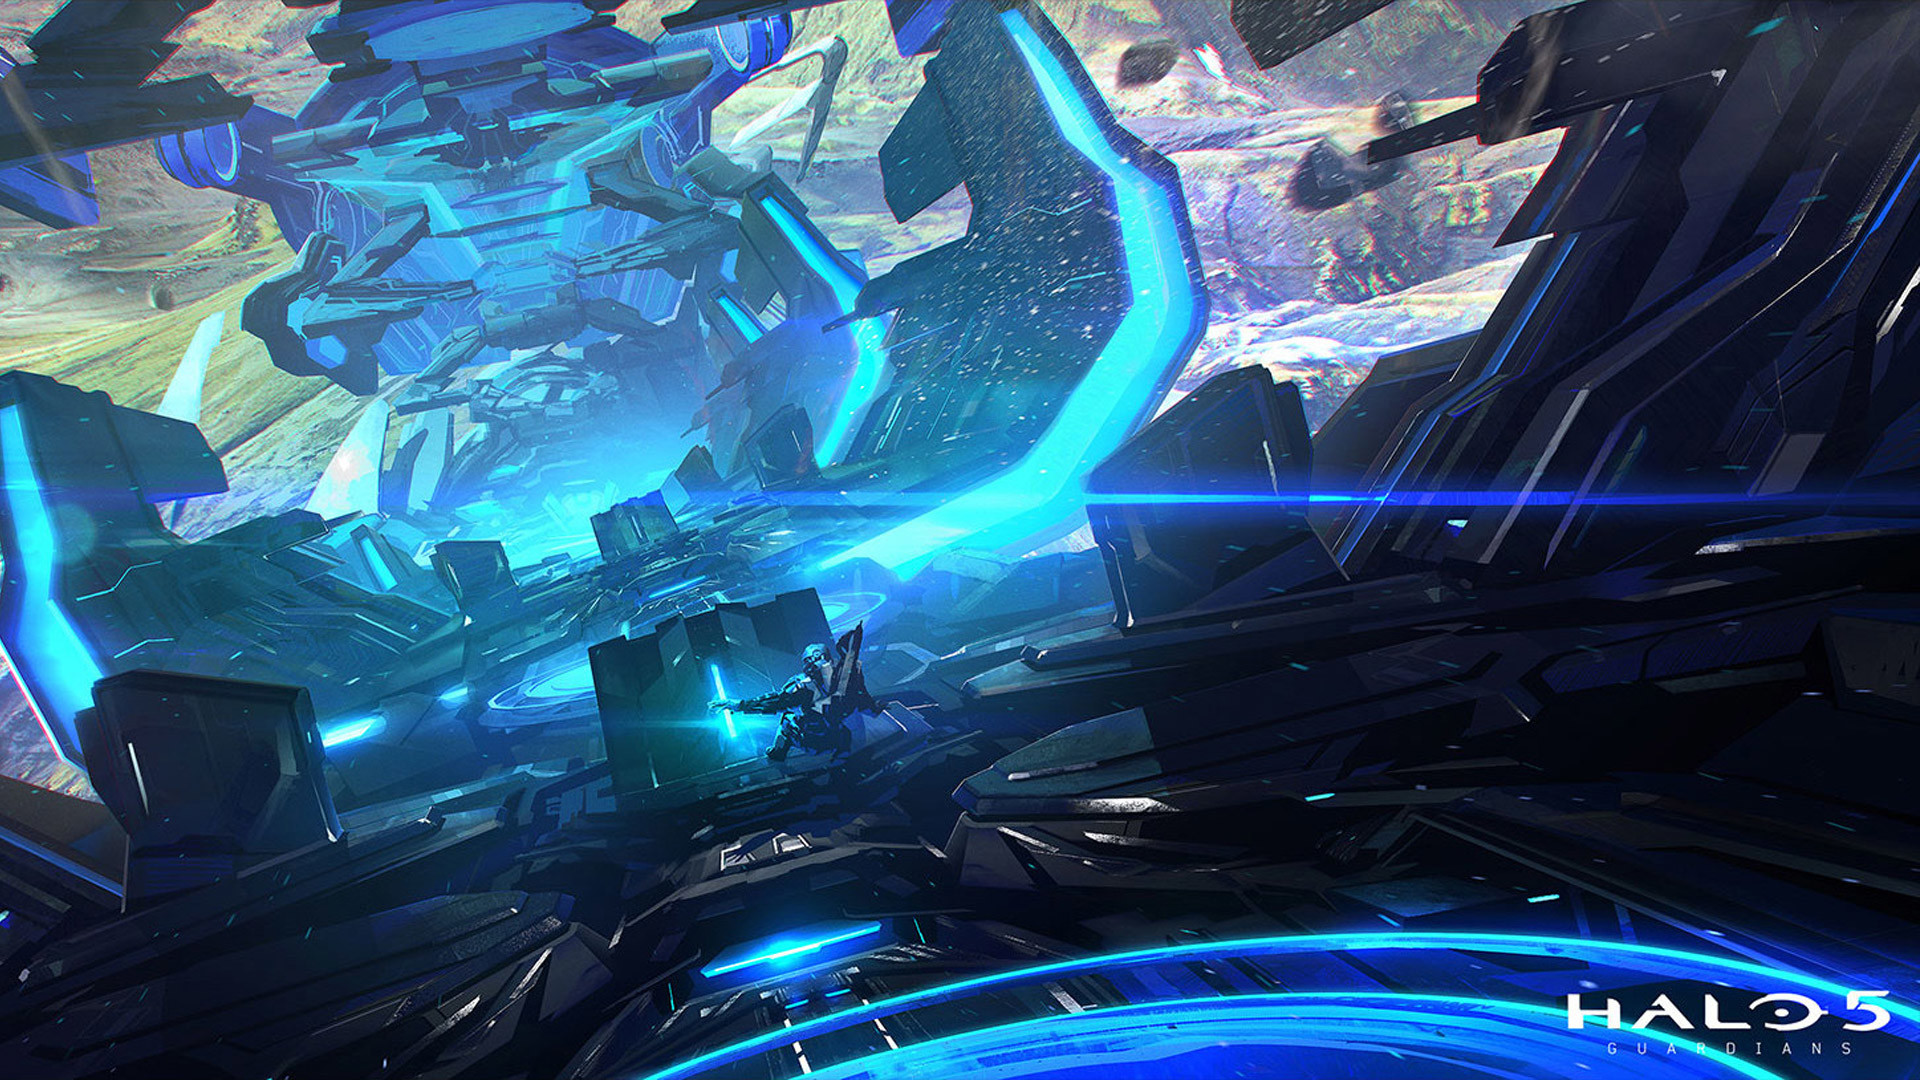 Halo 5 wallpaper 1920x1080 67 images - Halo 5 guardians wallpaper 1920x1080 ...